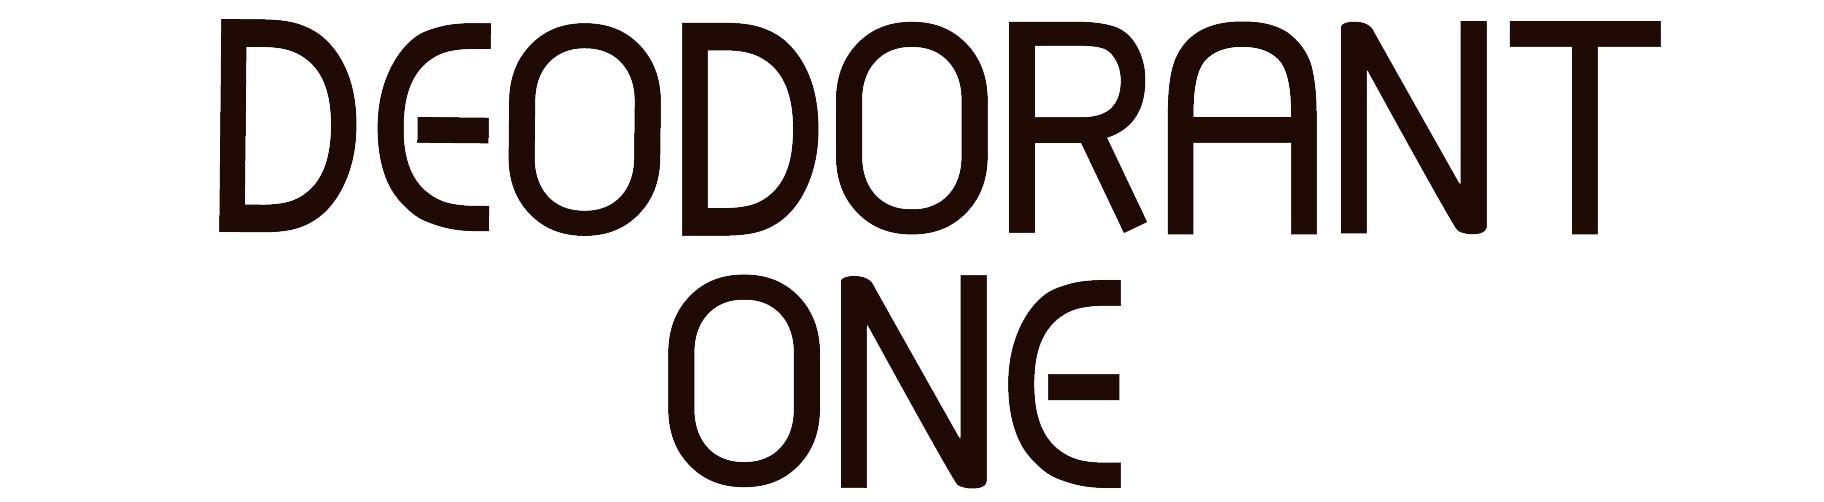 deodorant one logo